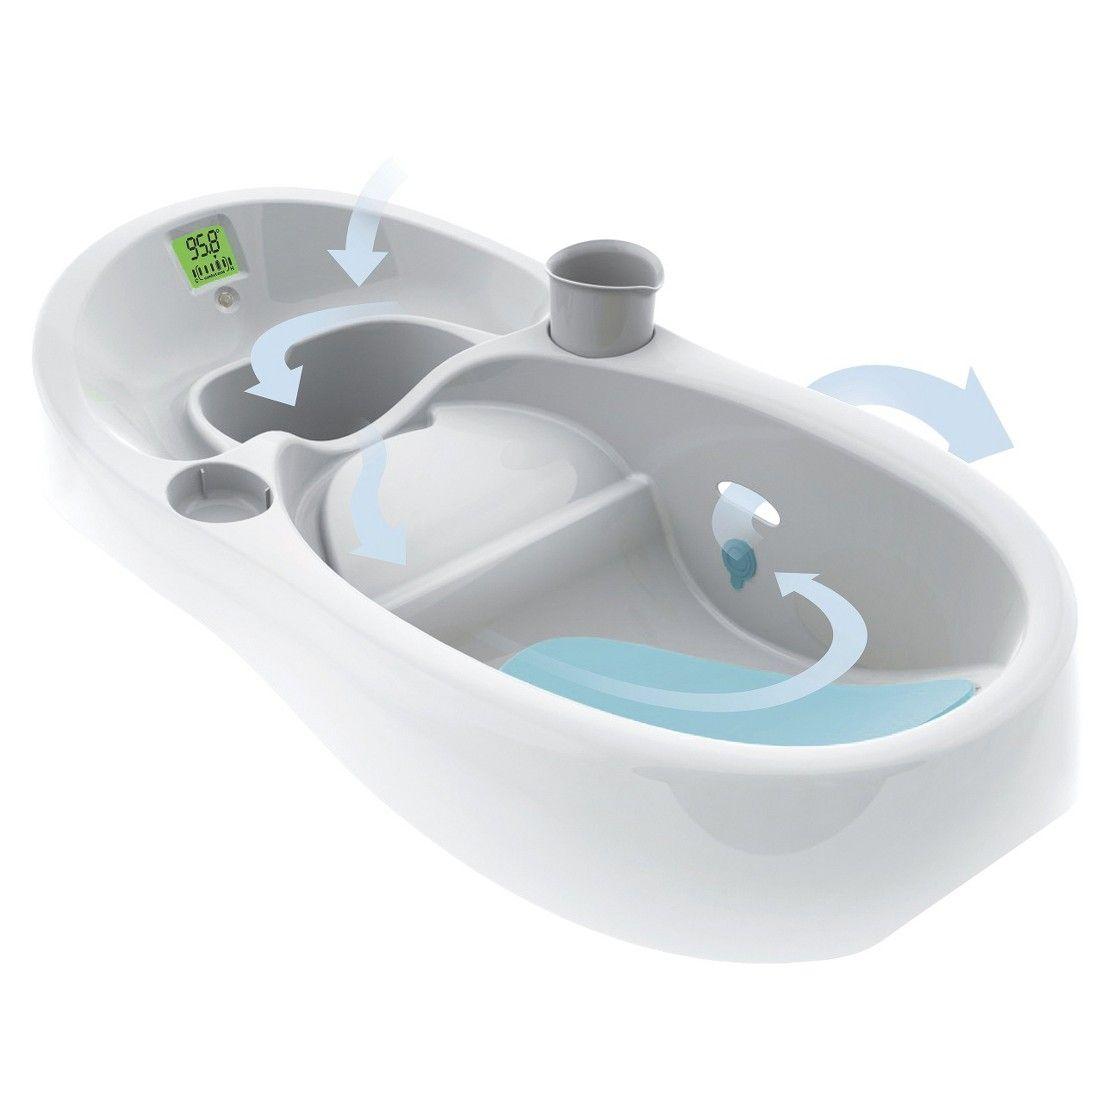 4moms Infant Tub, bath tubs | Tubs, Baby and Babies